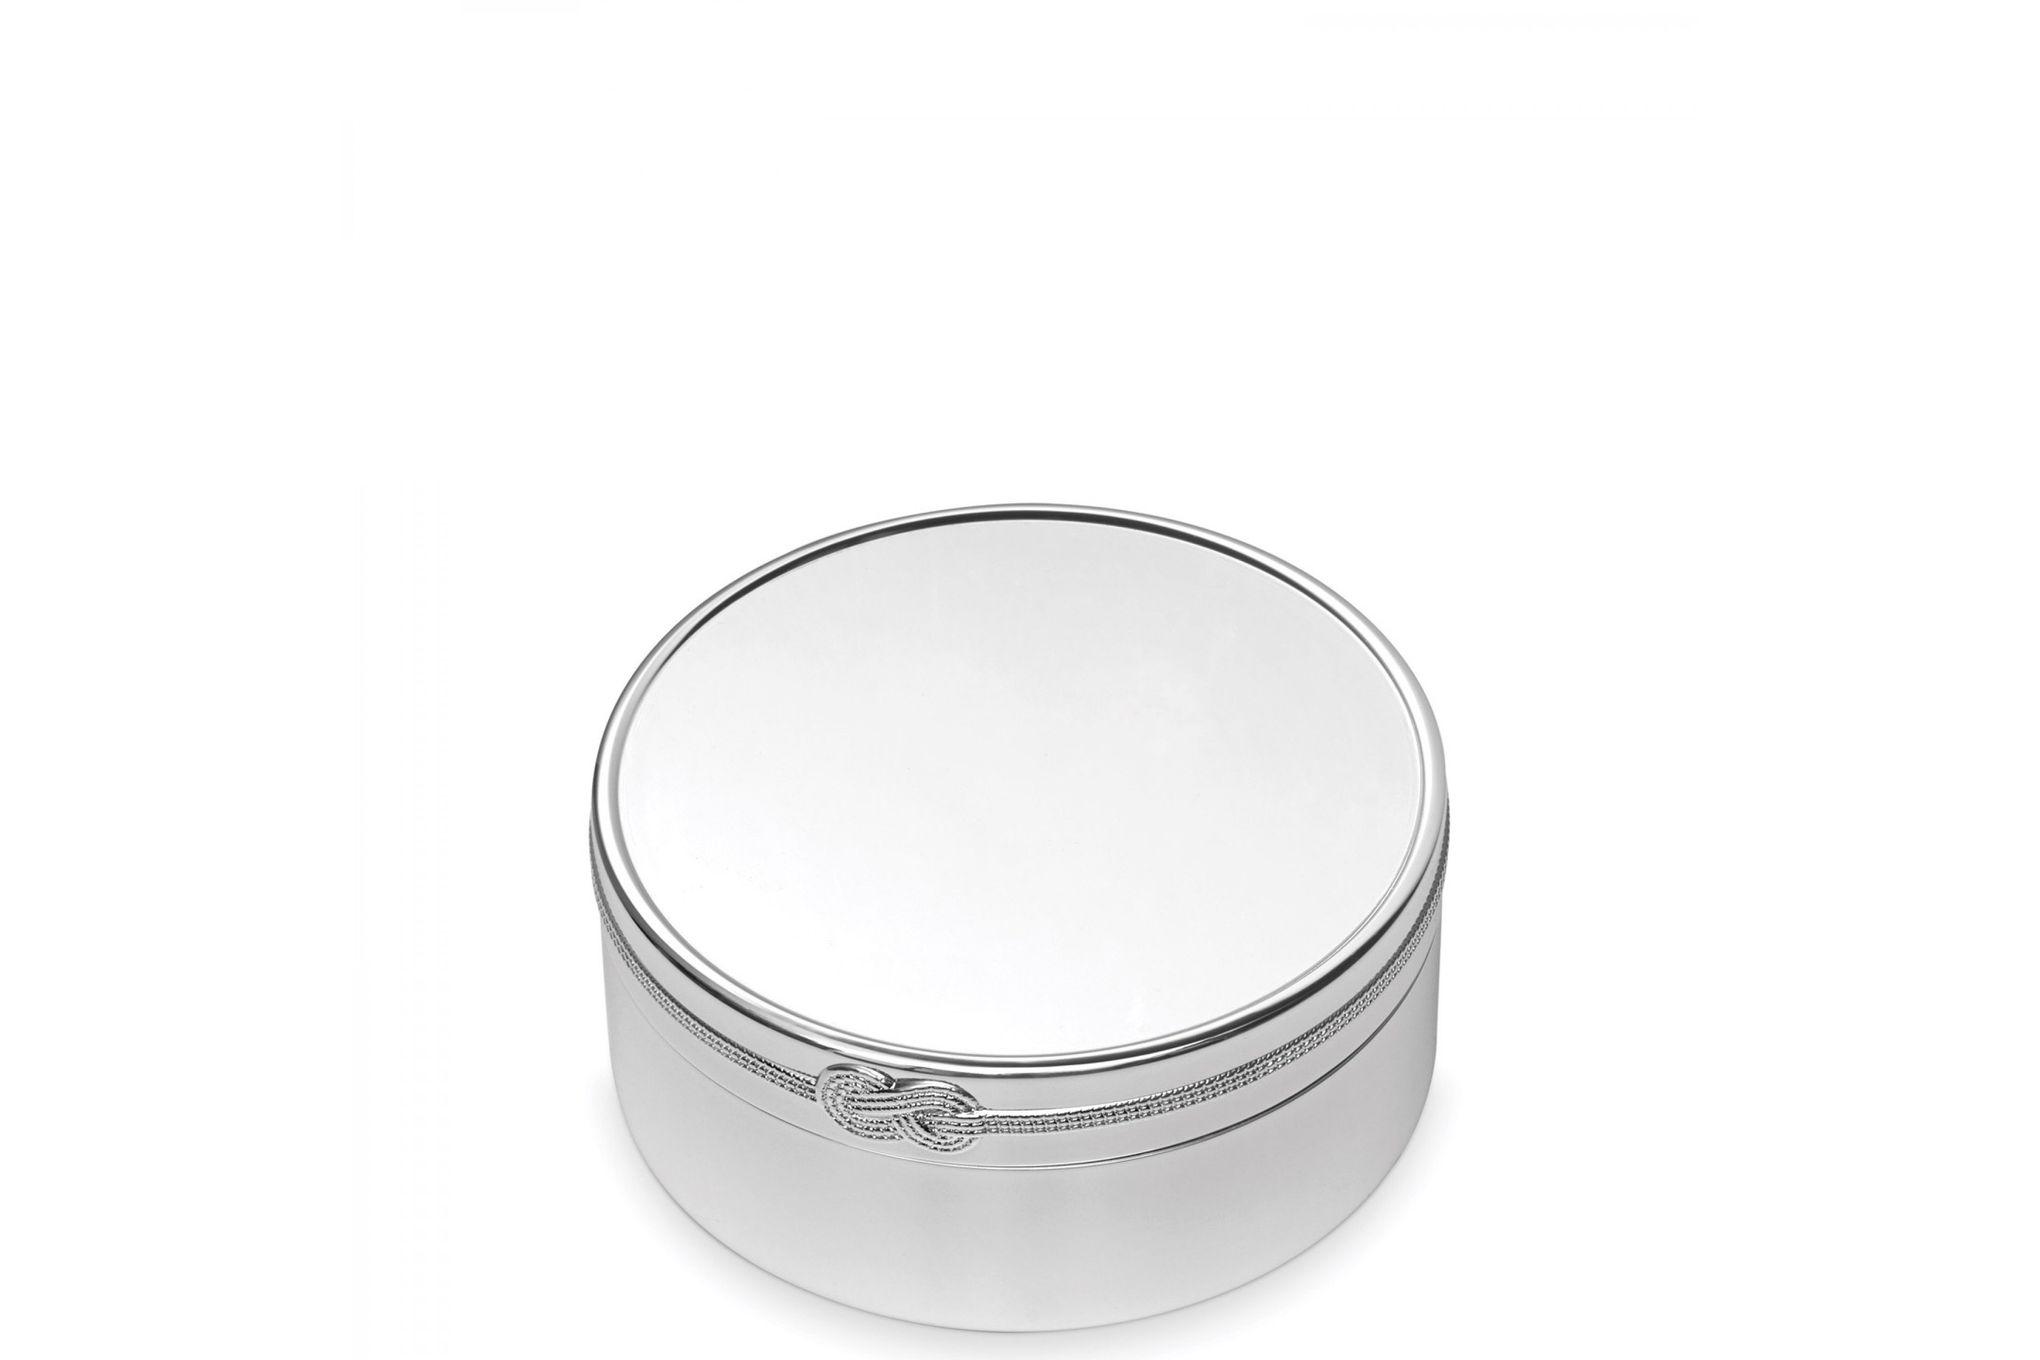 "Vera Wang for Wedgwood Gifts & Accessories Keepsake Box Infinity 7 1/2 x 3 1/2"" thumb 1"